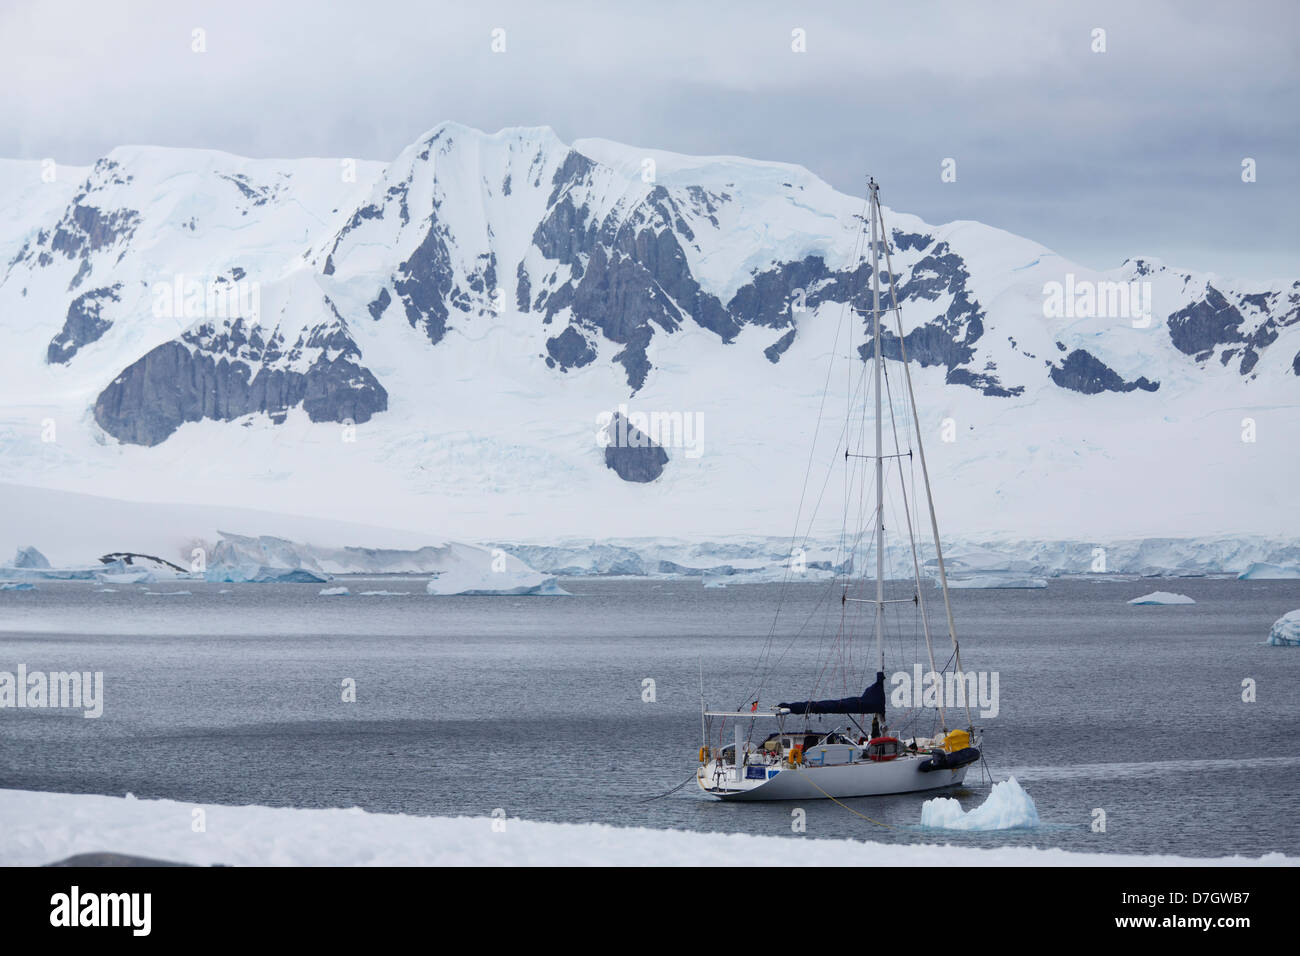 A sailboat at Cuverville Island, Antarctica. - Stock Image